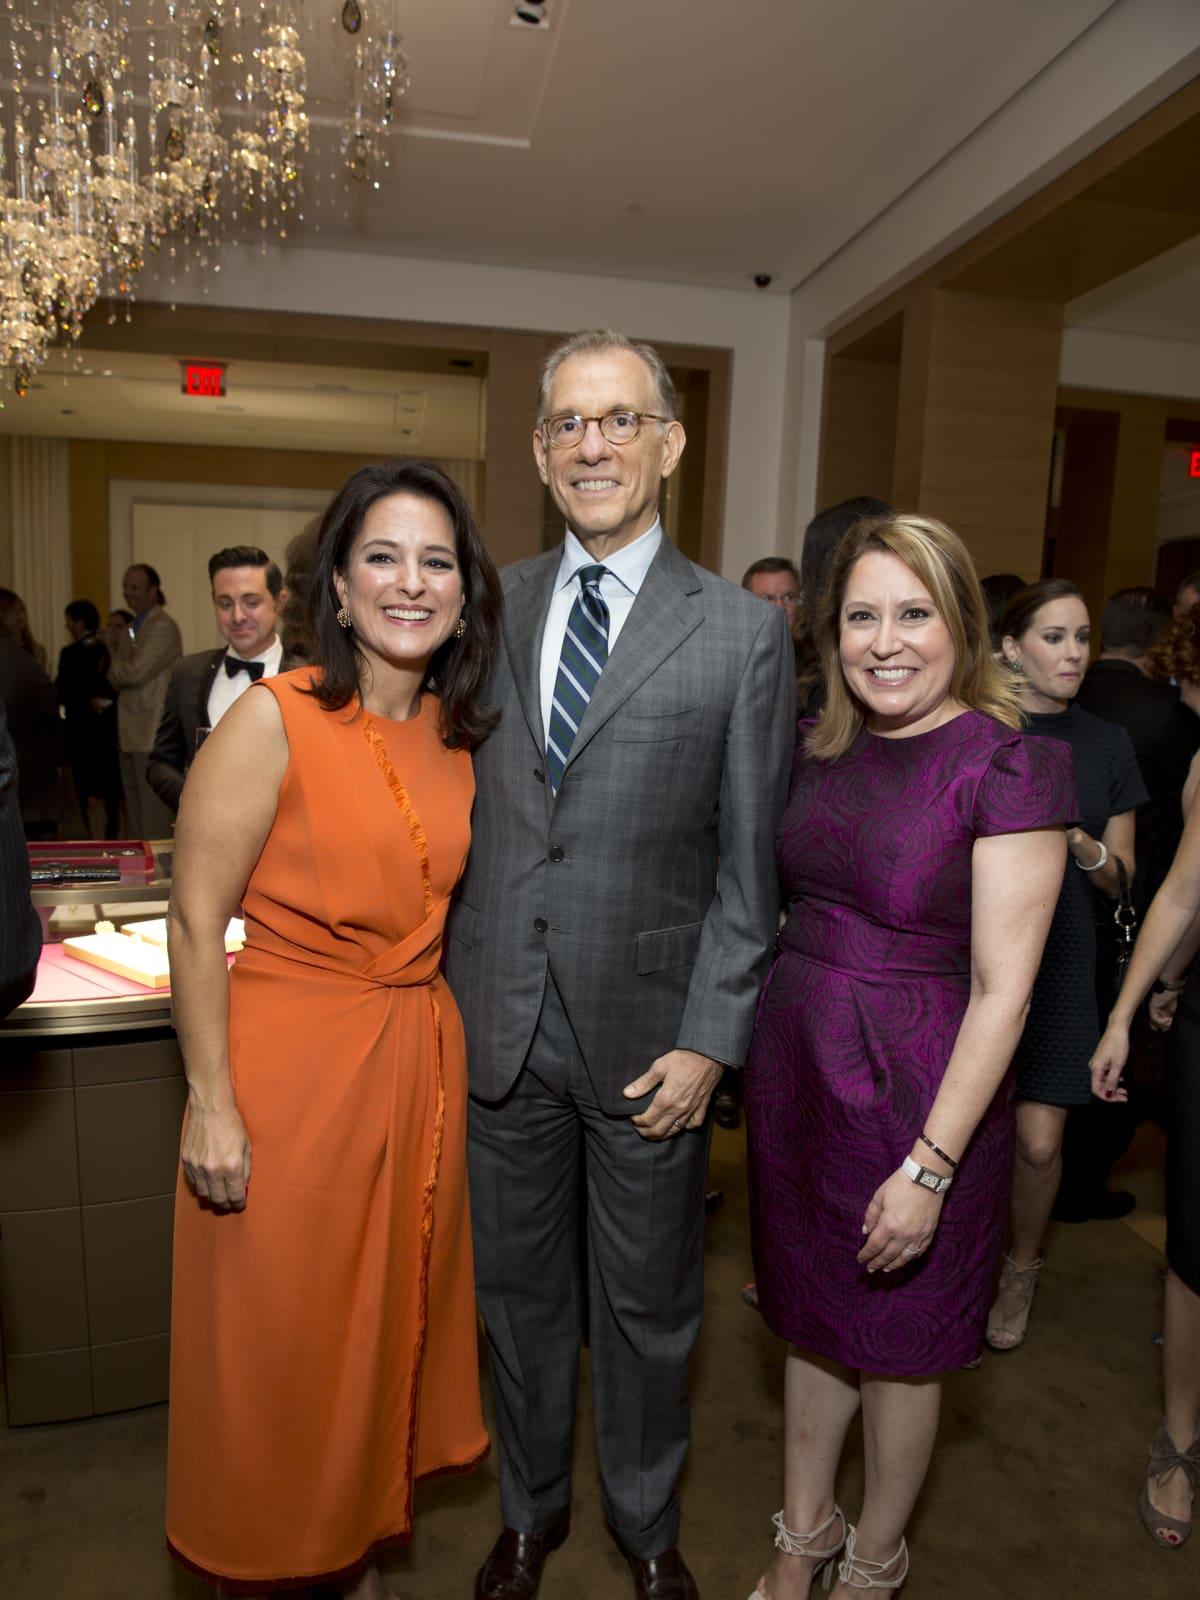 News, Shelby, Cartier opening, Oct. 2015, Mercedes Abramo, Gary Tinterow, Kari Gonzales